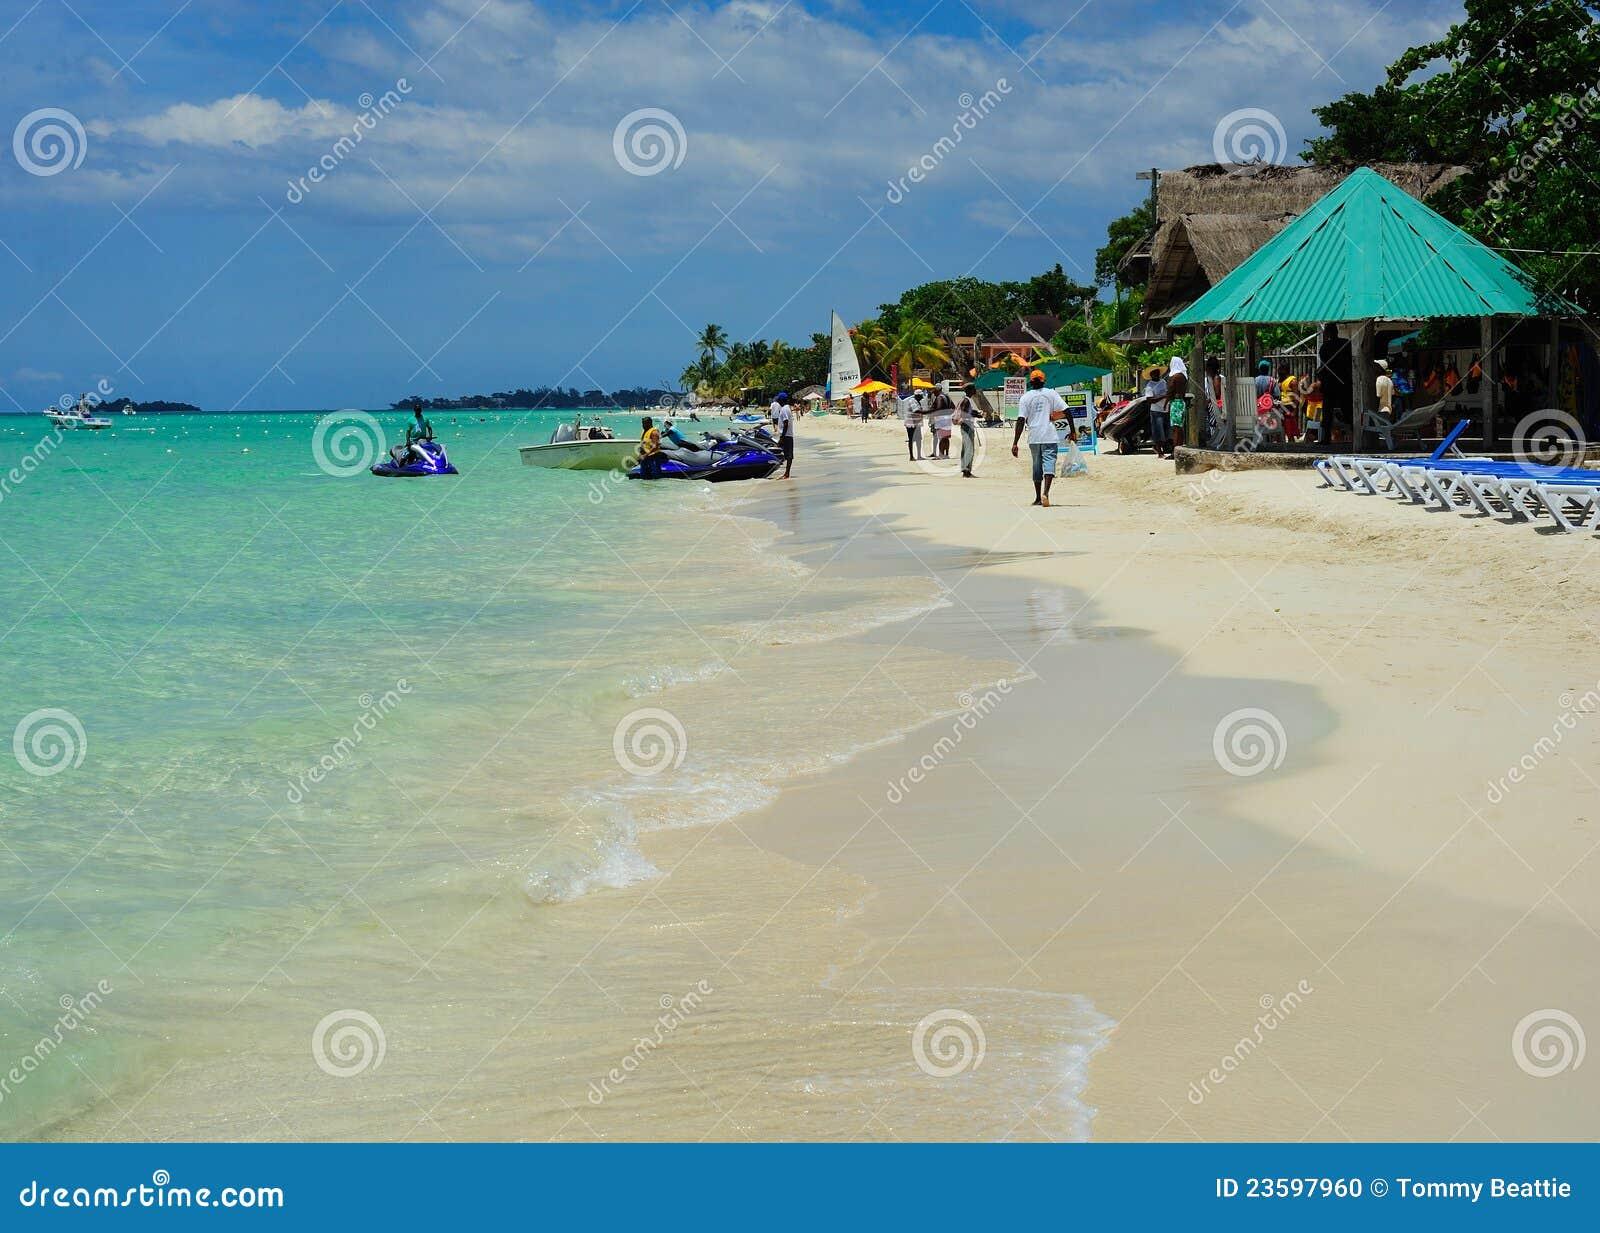 Negril Beach in Jamaica